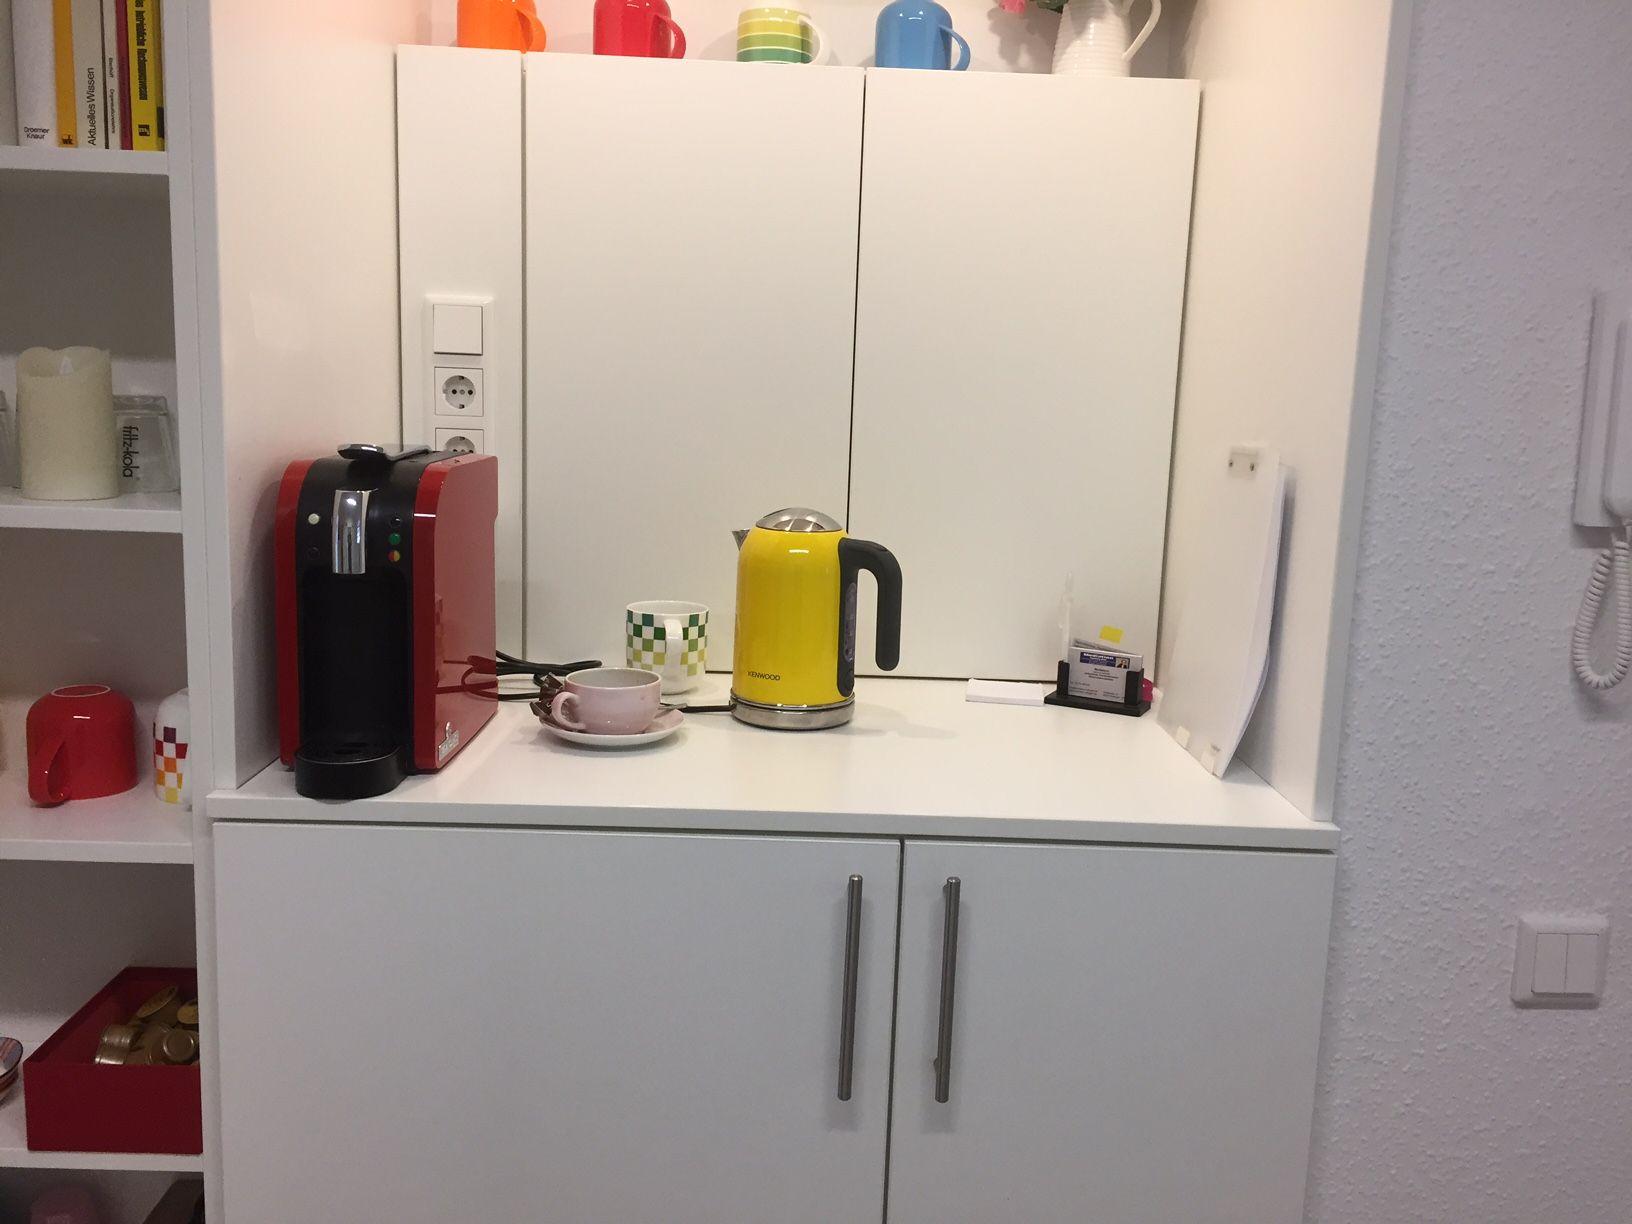 Altstadtbüro Teeküche